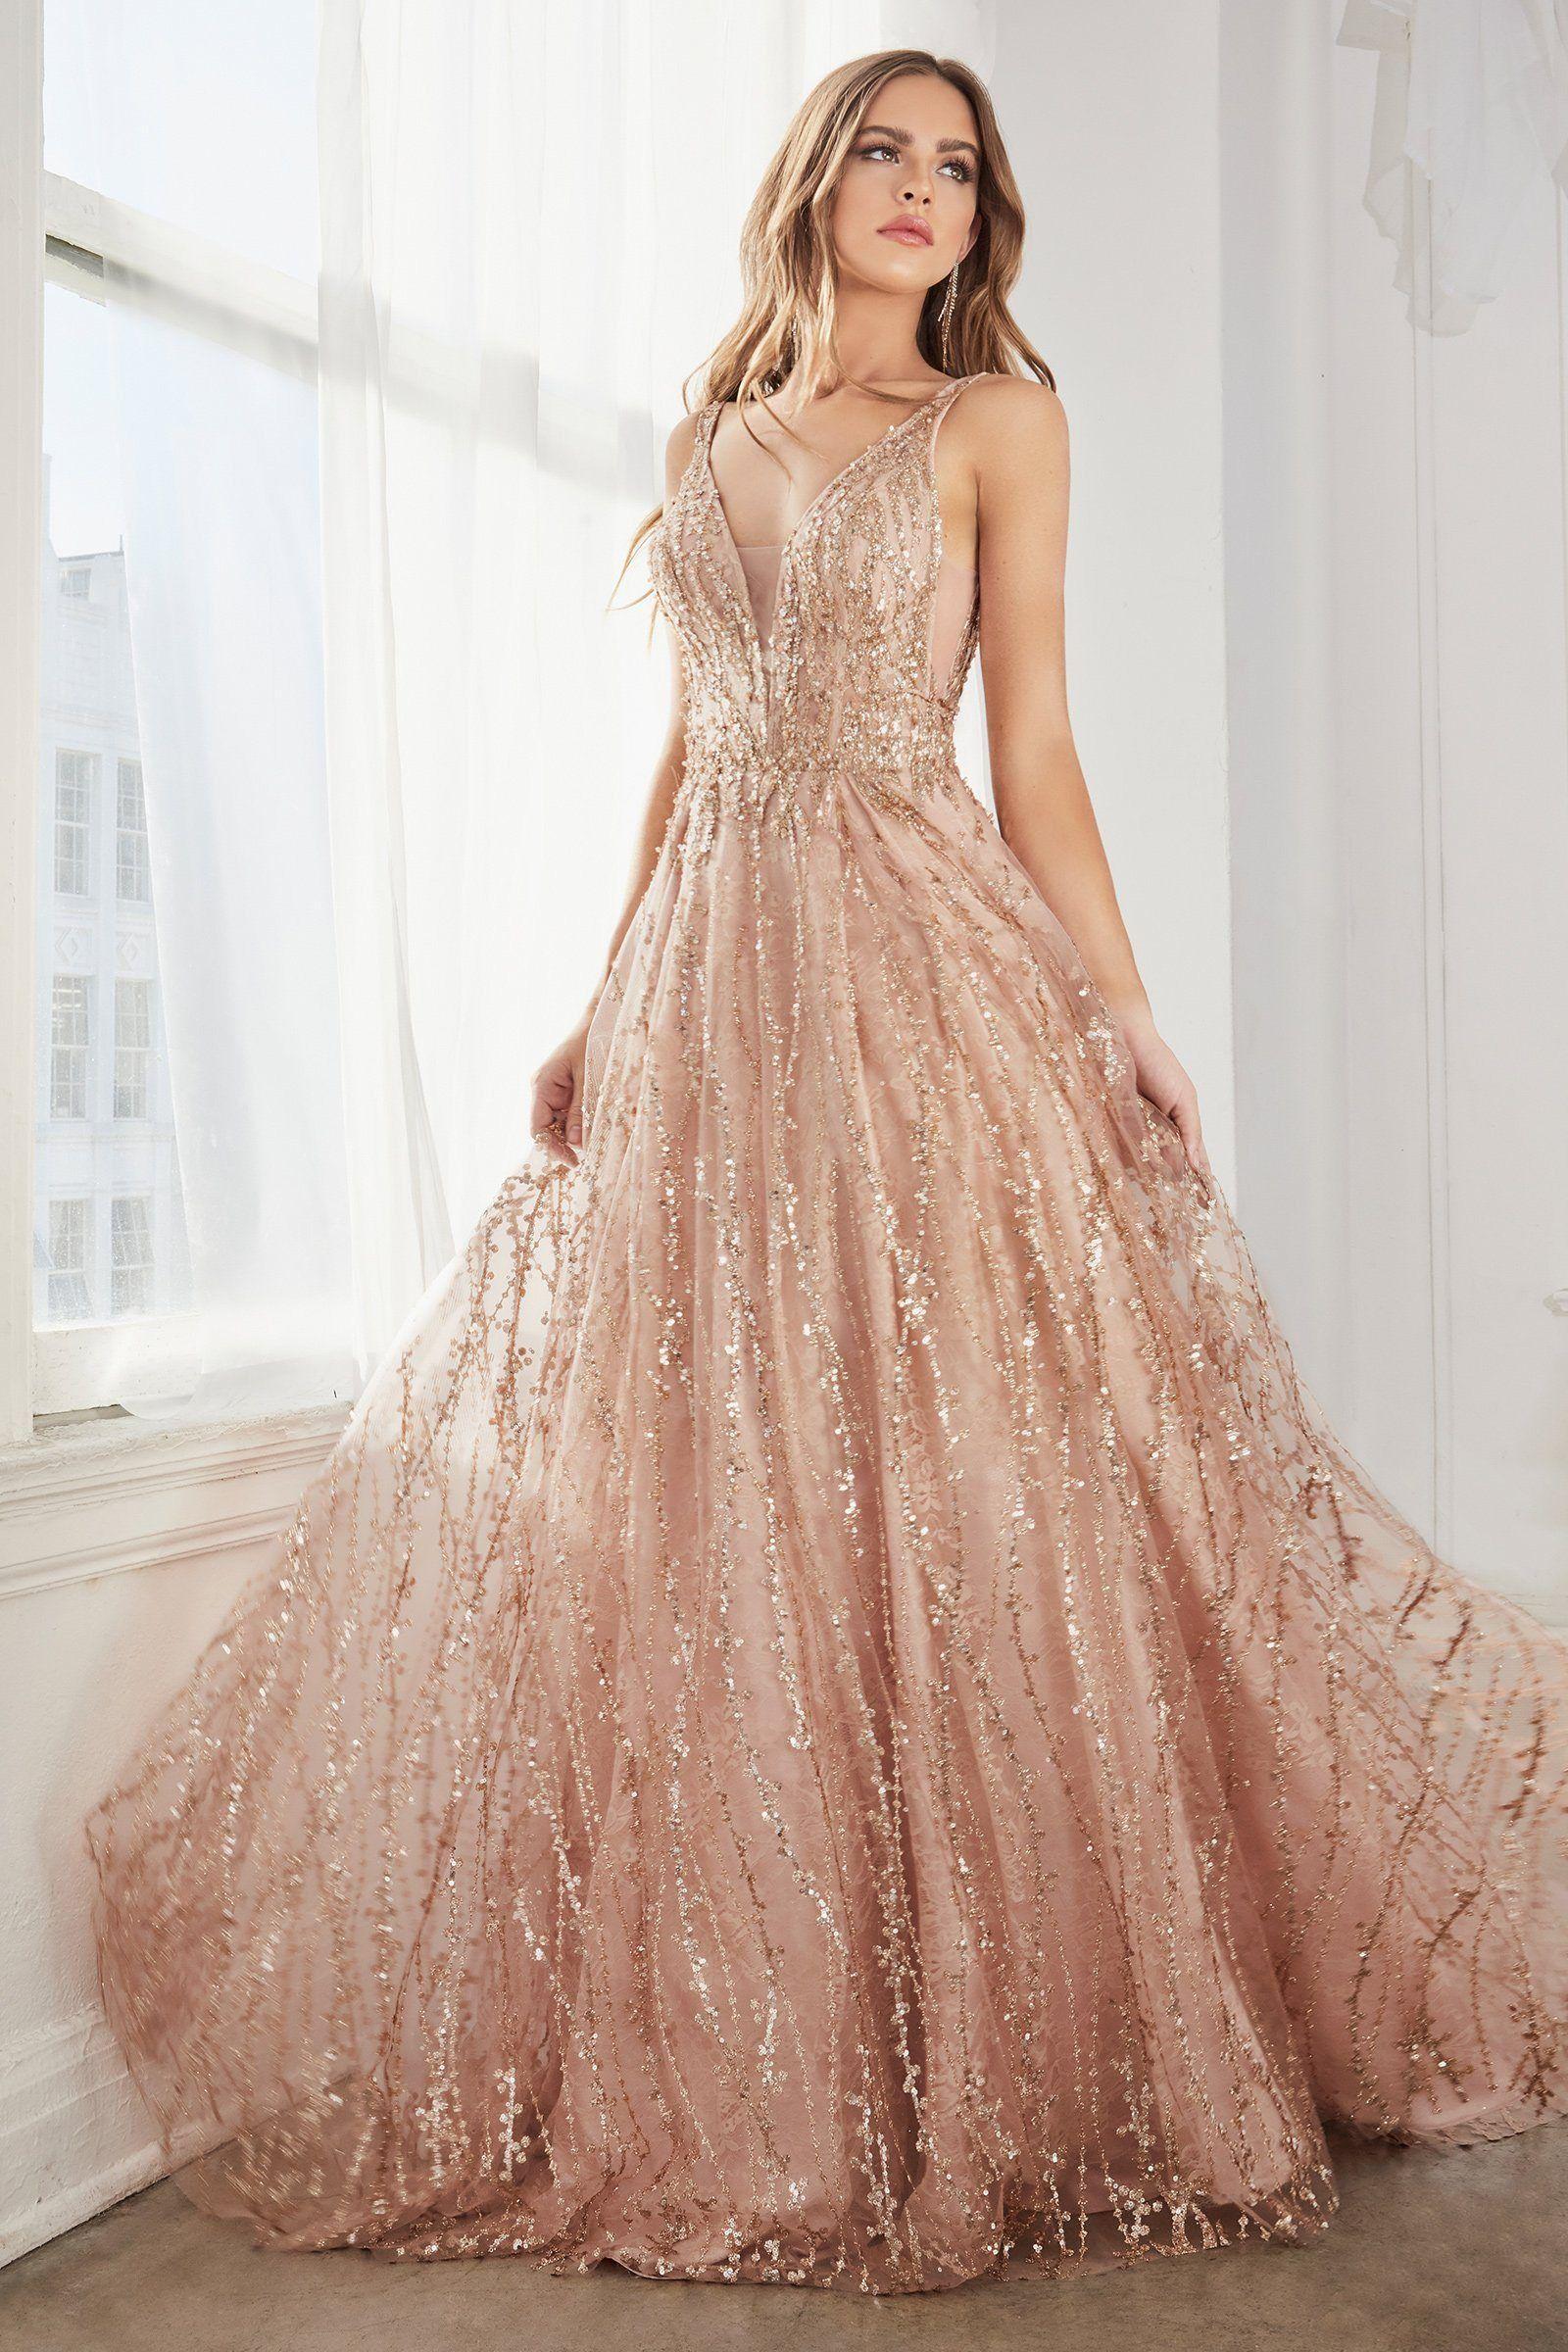 Long A Line Glitter Lace Dress By Cinderella Divine C32 Cute Prom Dresses Gowns Fancy Dresses [ 2400 x 1600 Pixel ]